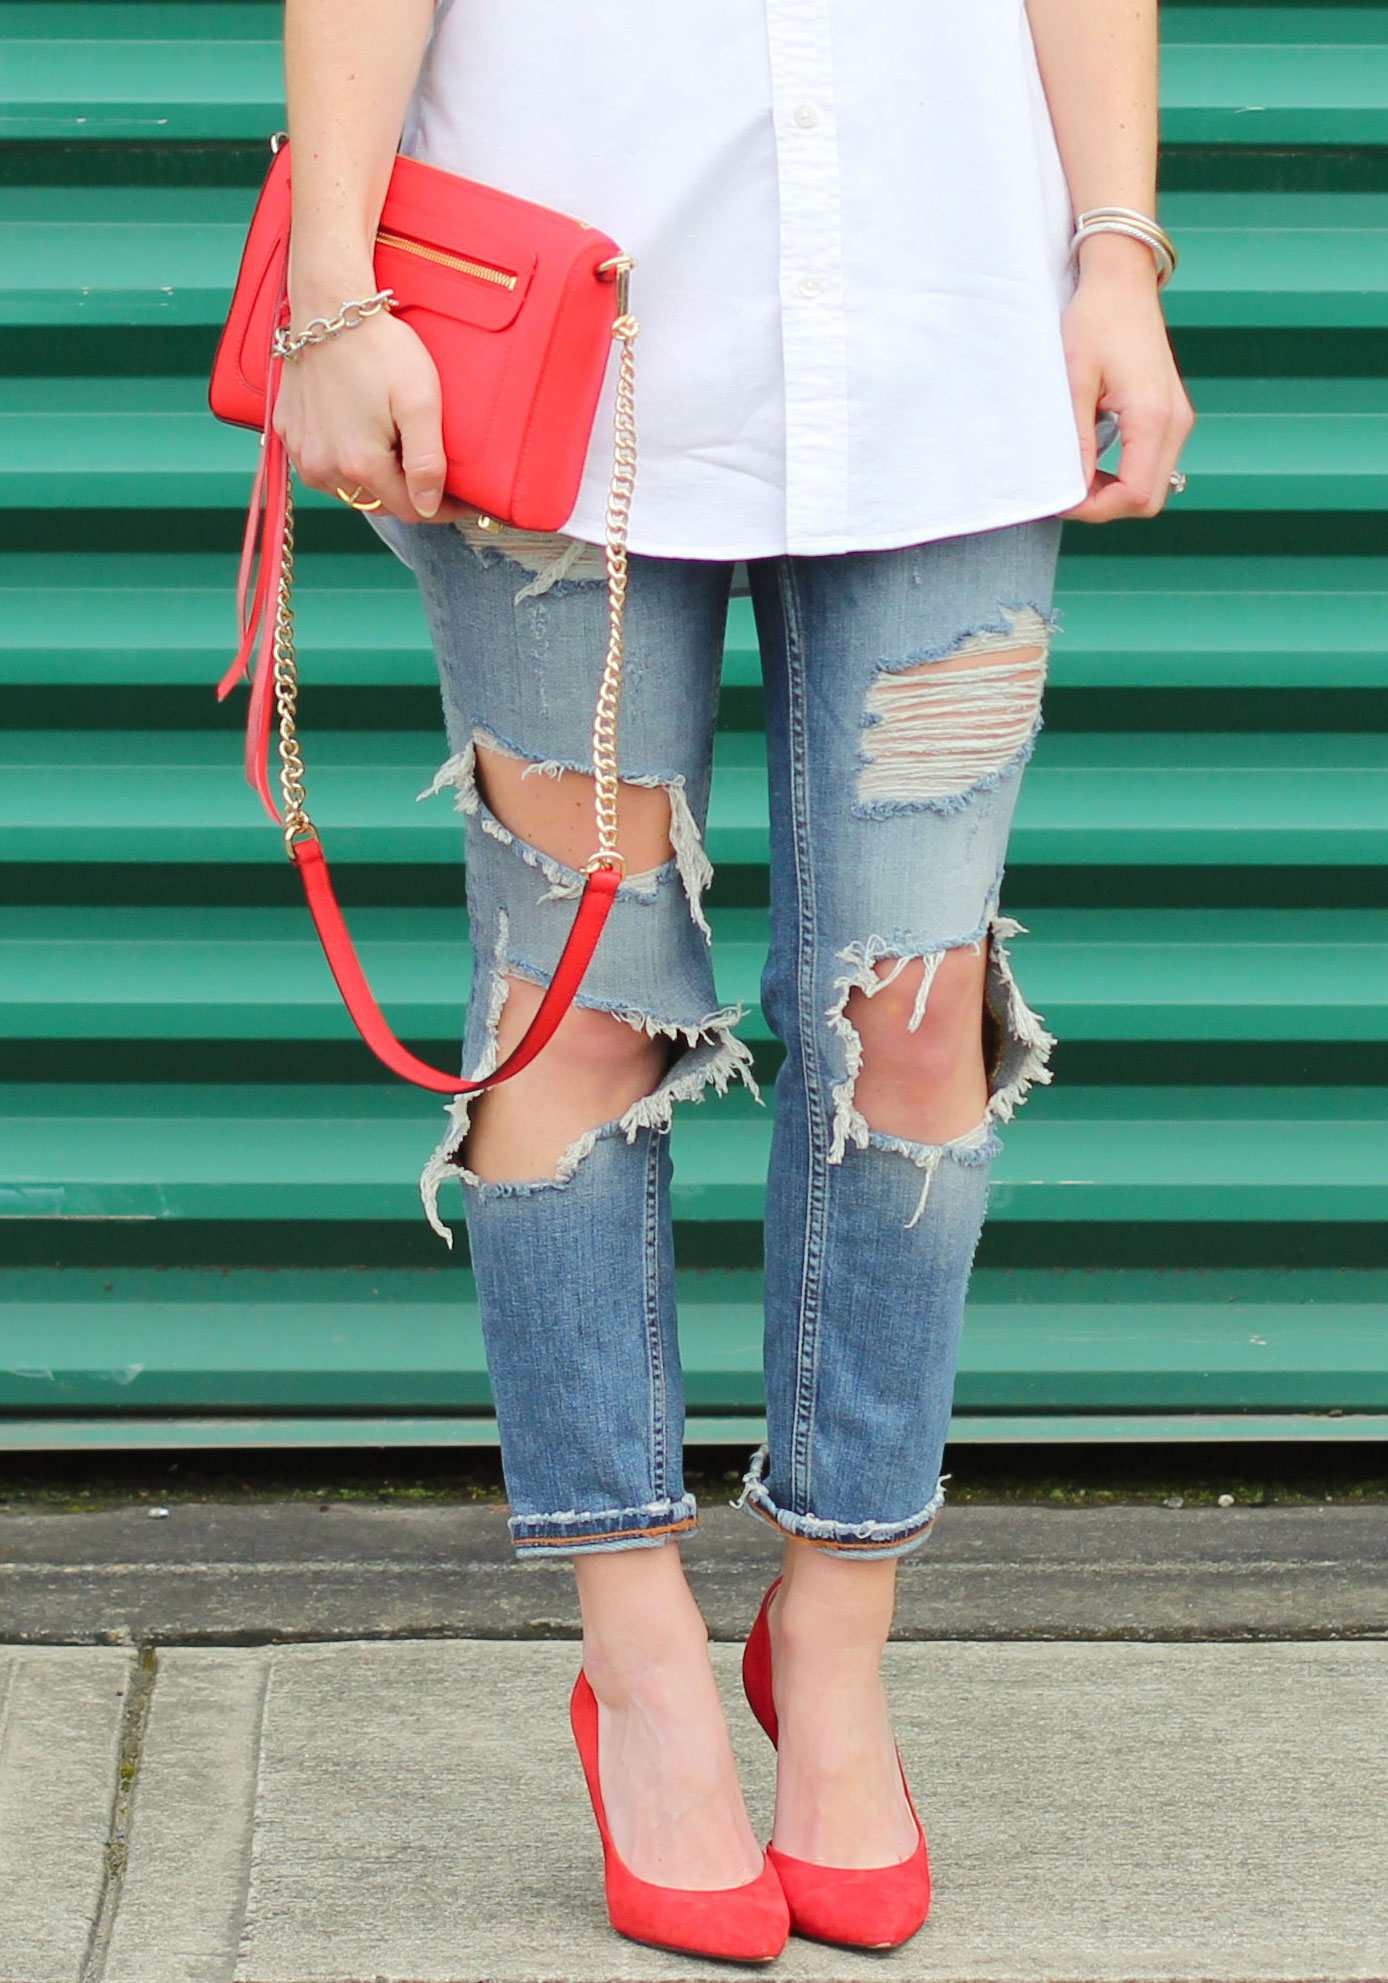 Zara Destroyed Girlfriend Jeans, Red Pumps, Red Rebecca Minkoff Avery Crossbody Handbag, White Boyfriend Shirt